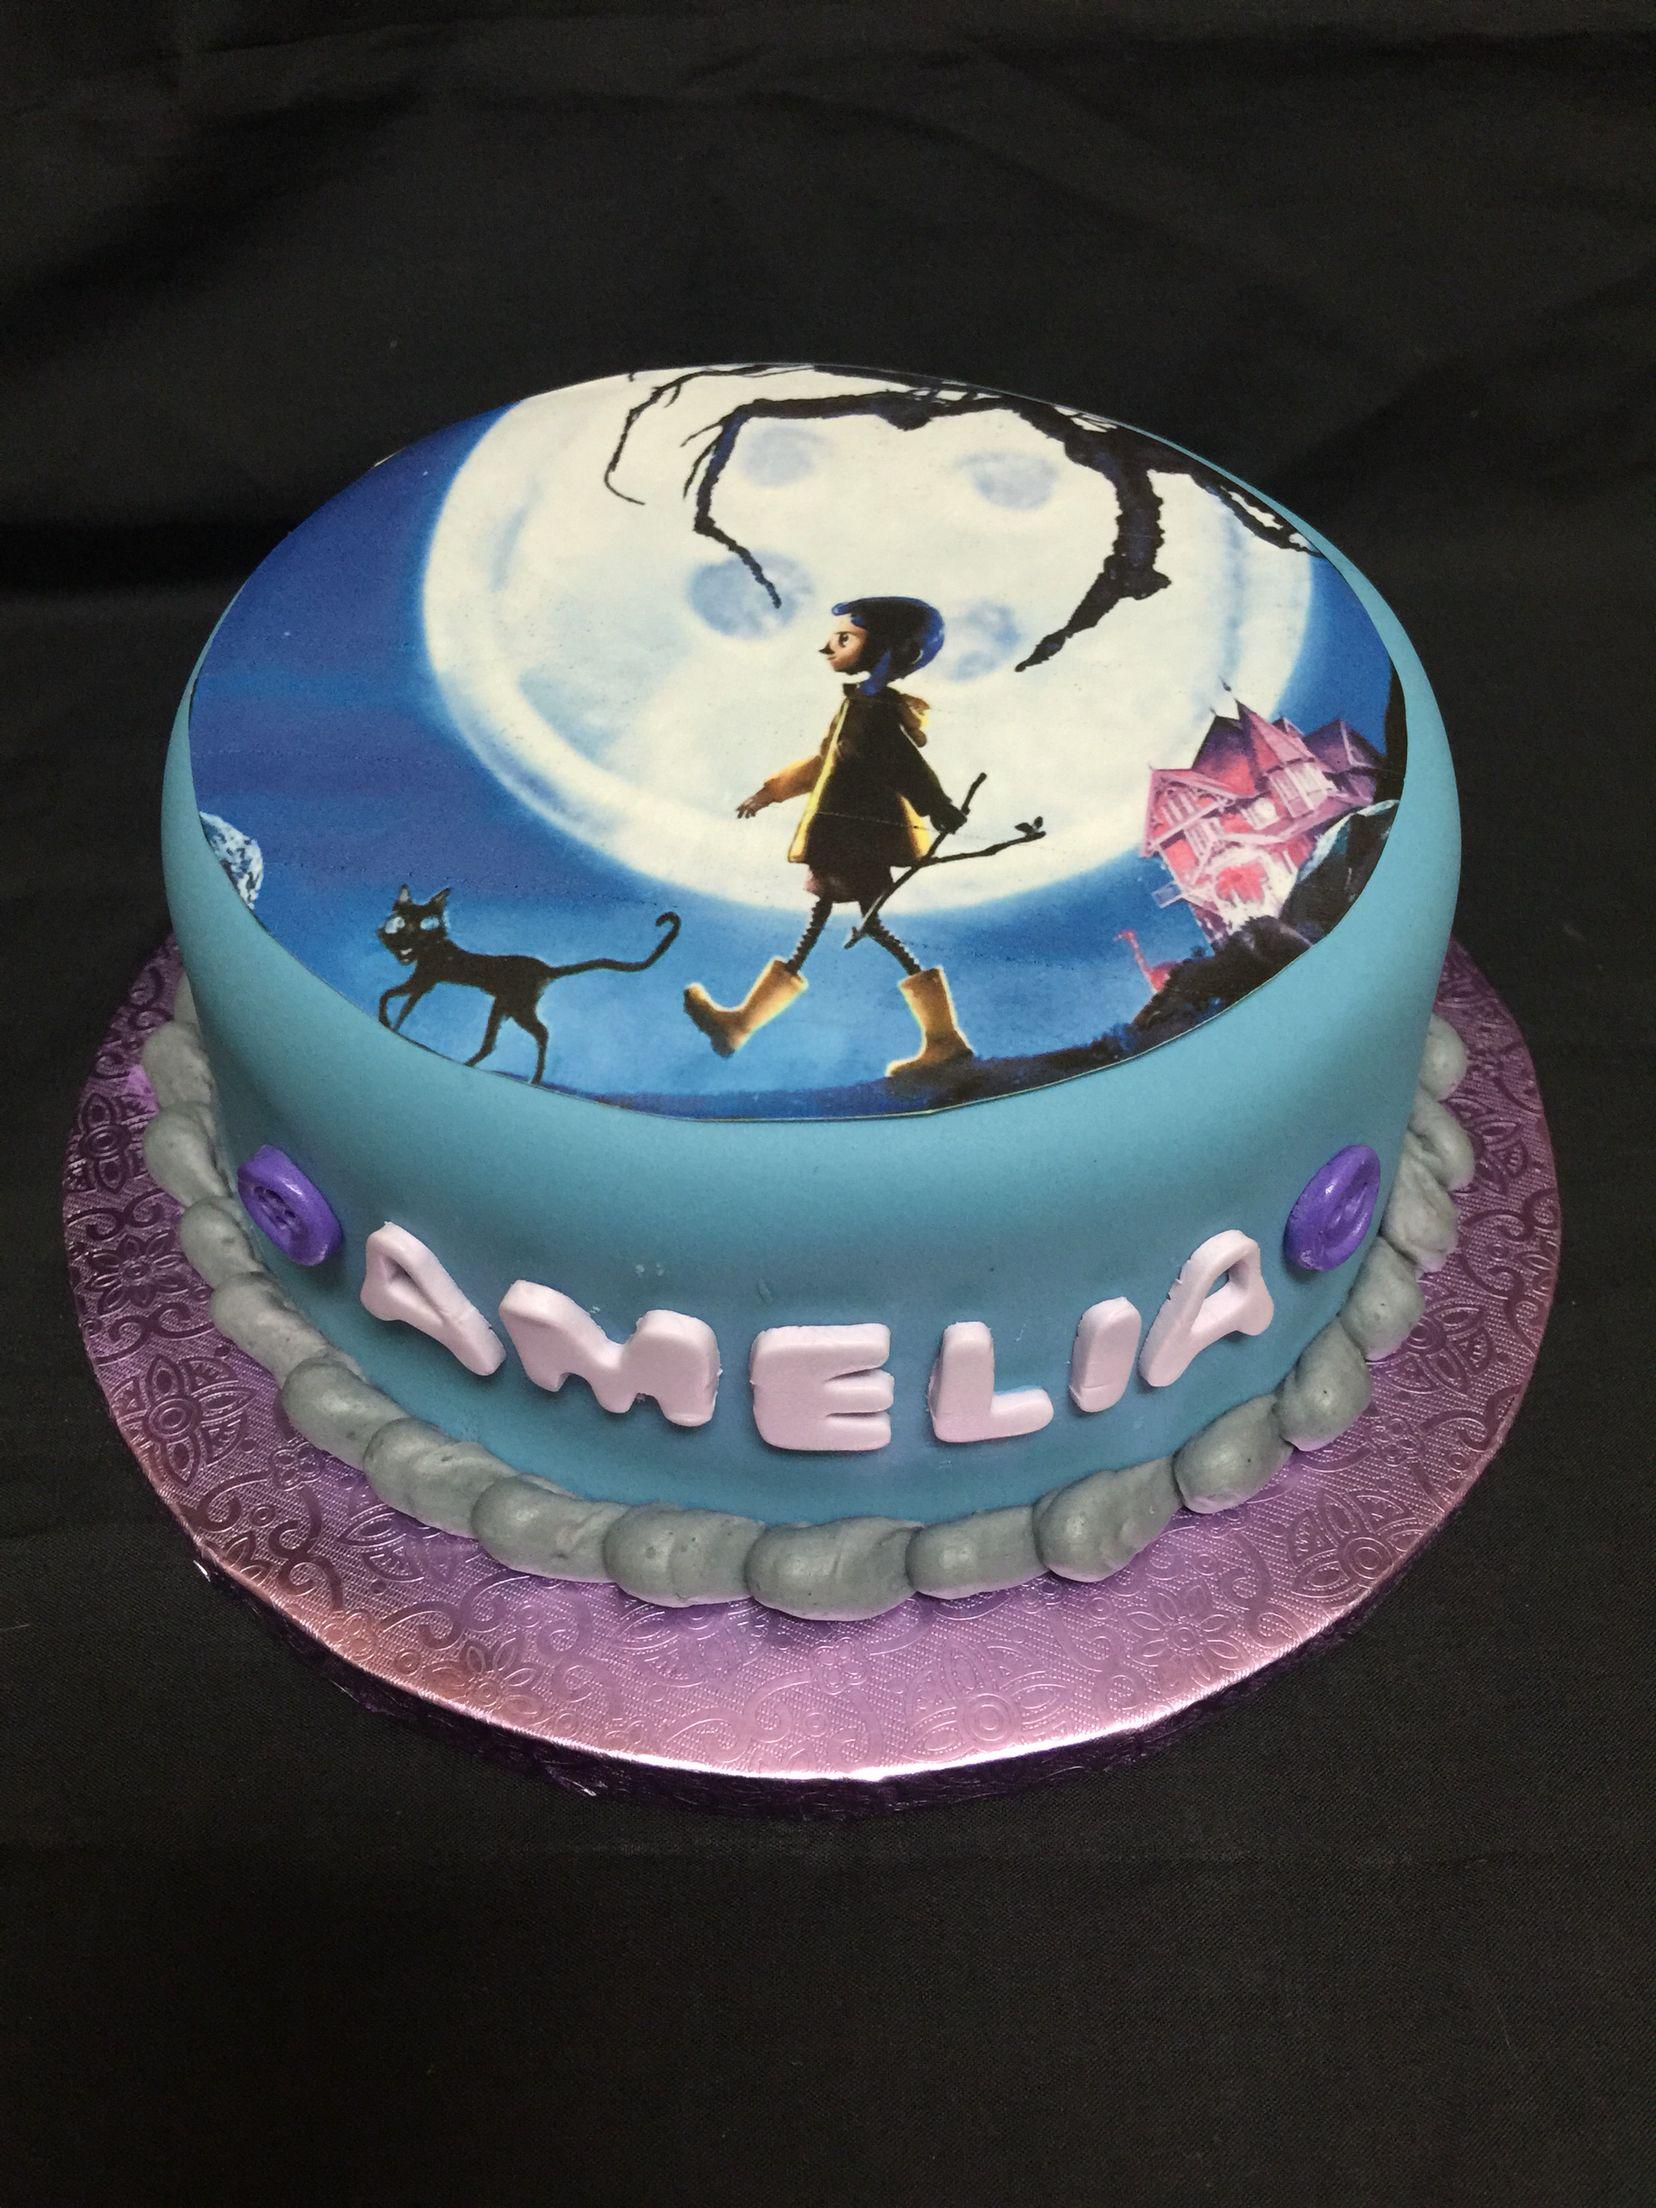 Astounding Coraline Birthday Cake Birthday Cake For Him Girl Cakes Funny Birthday Cards Online Inifodamsfinfo